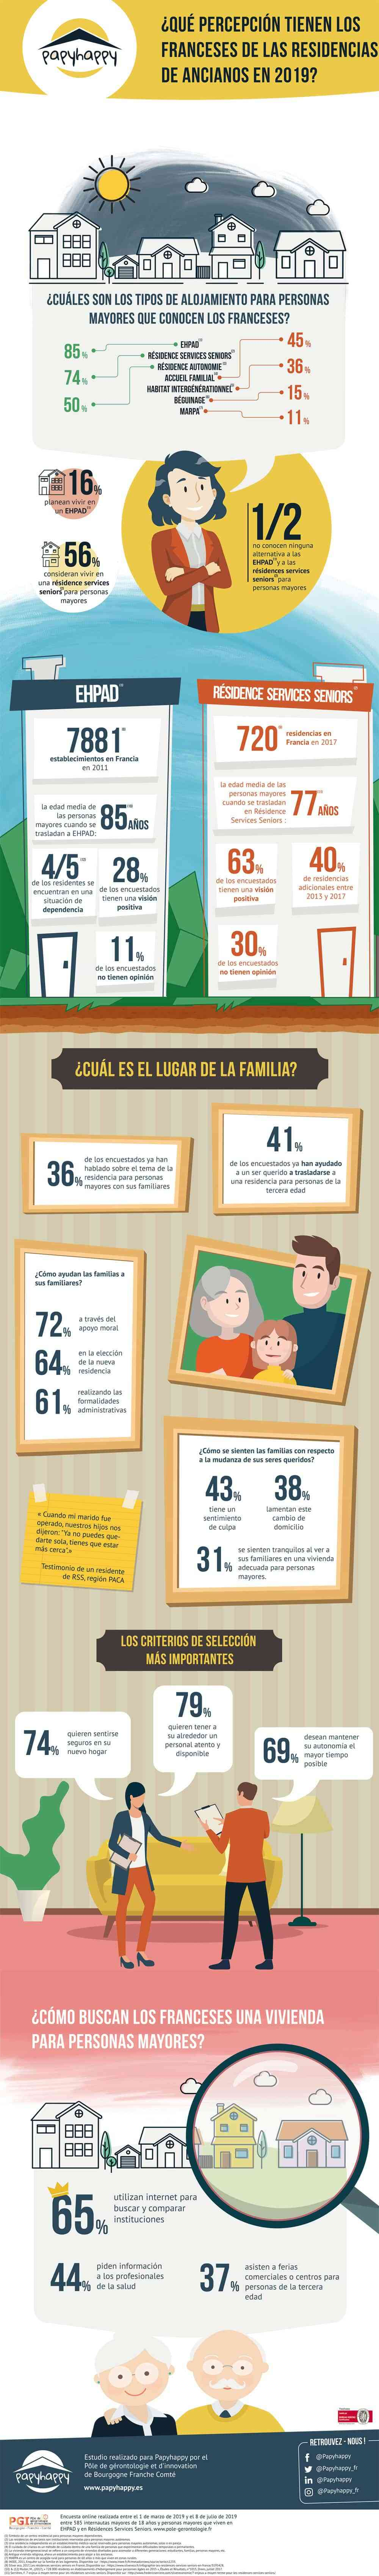 residencias ancianos francesas infografia